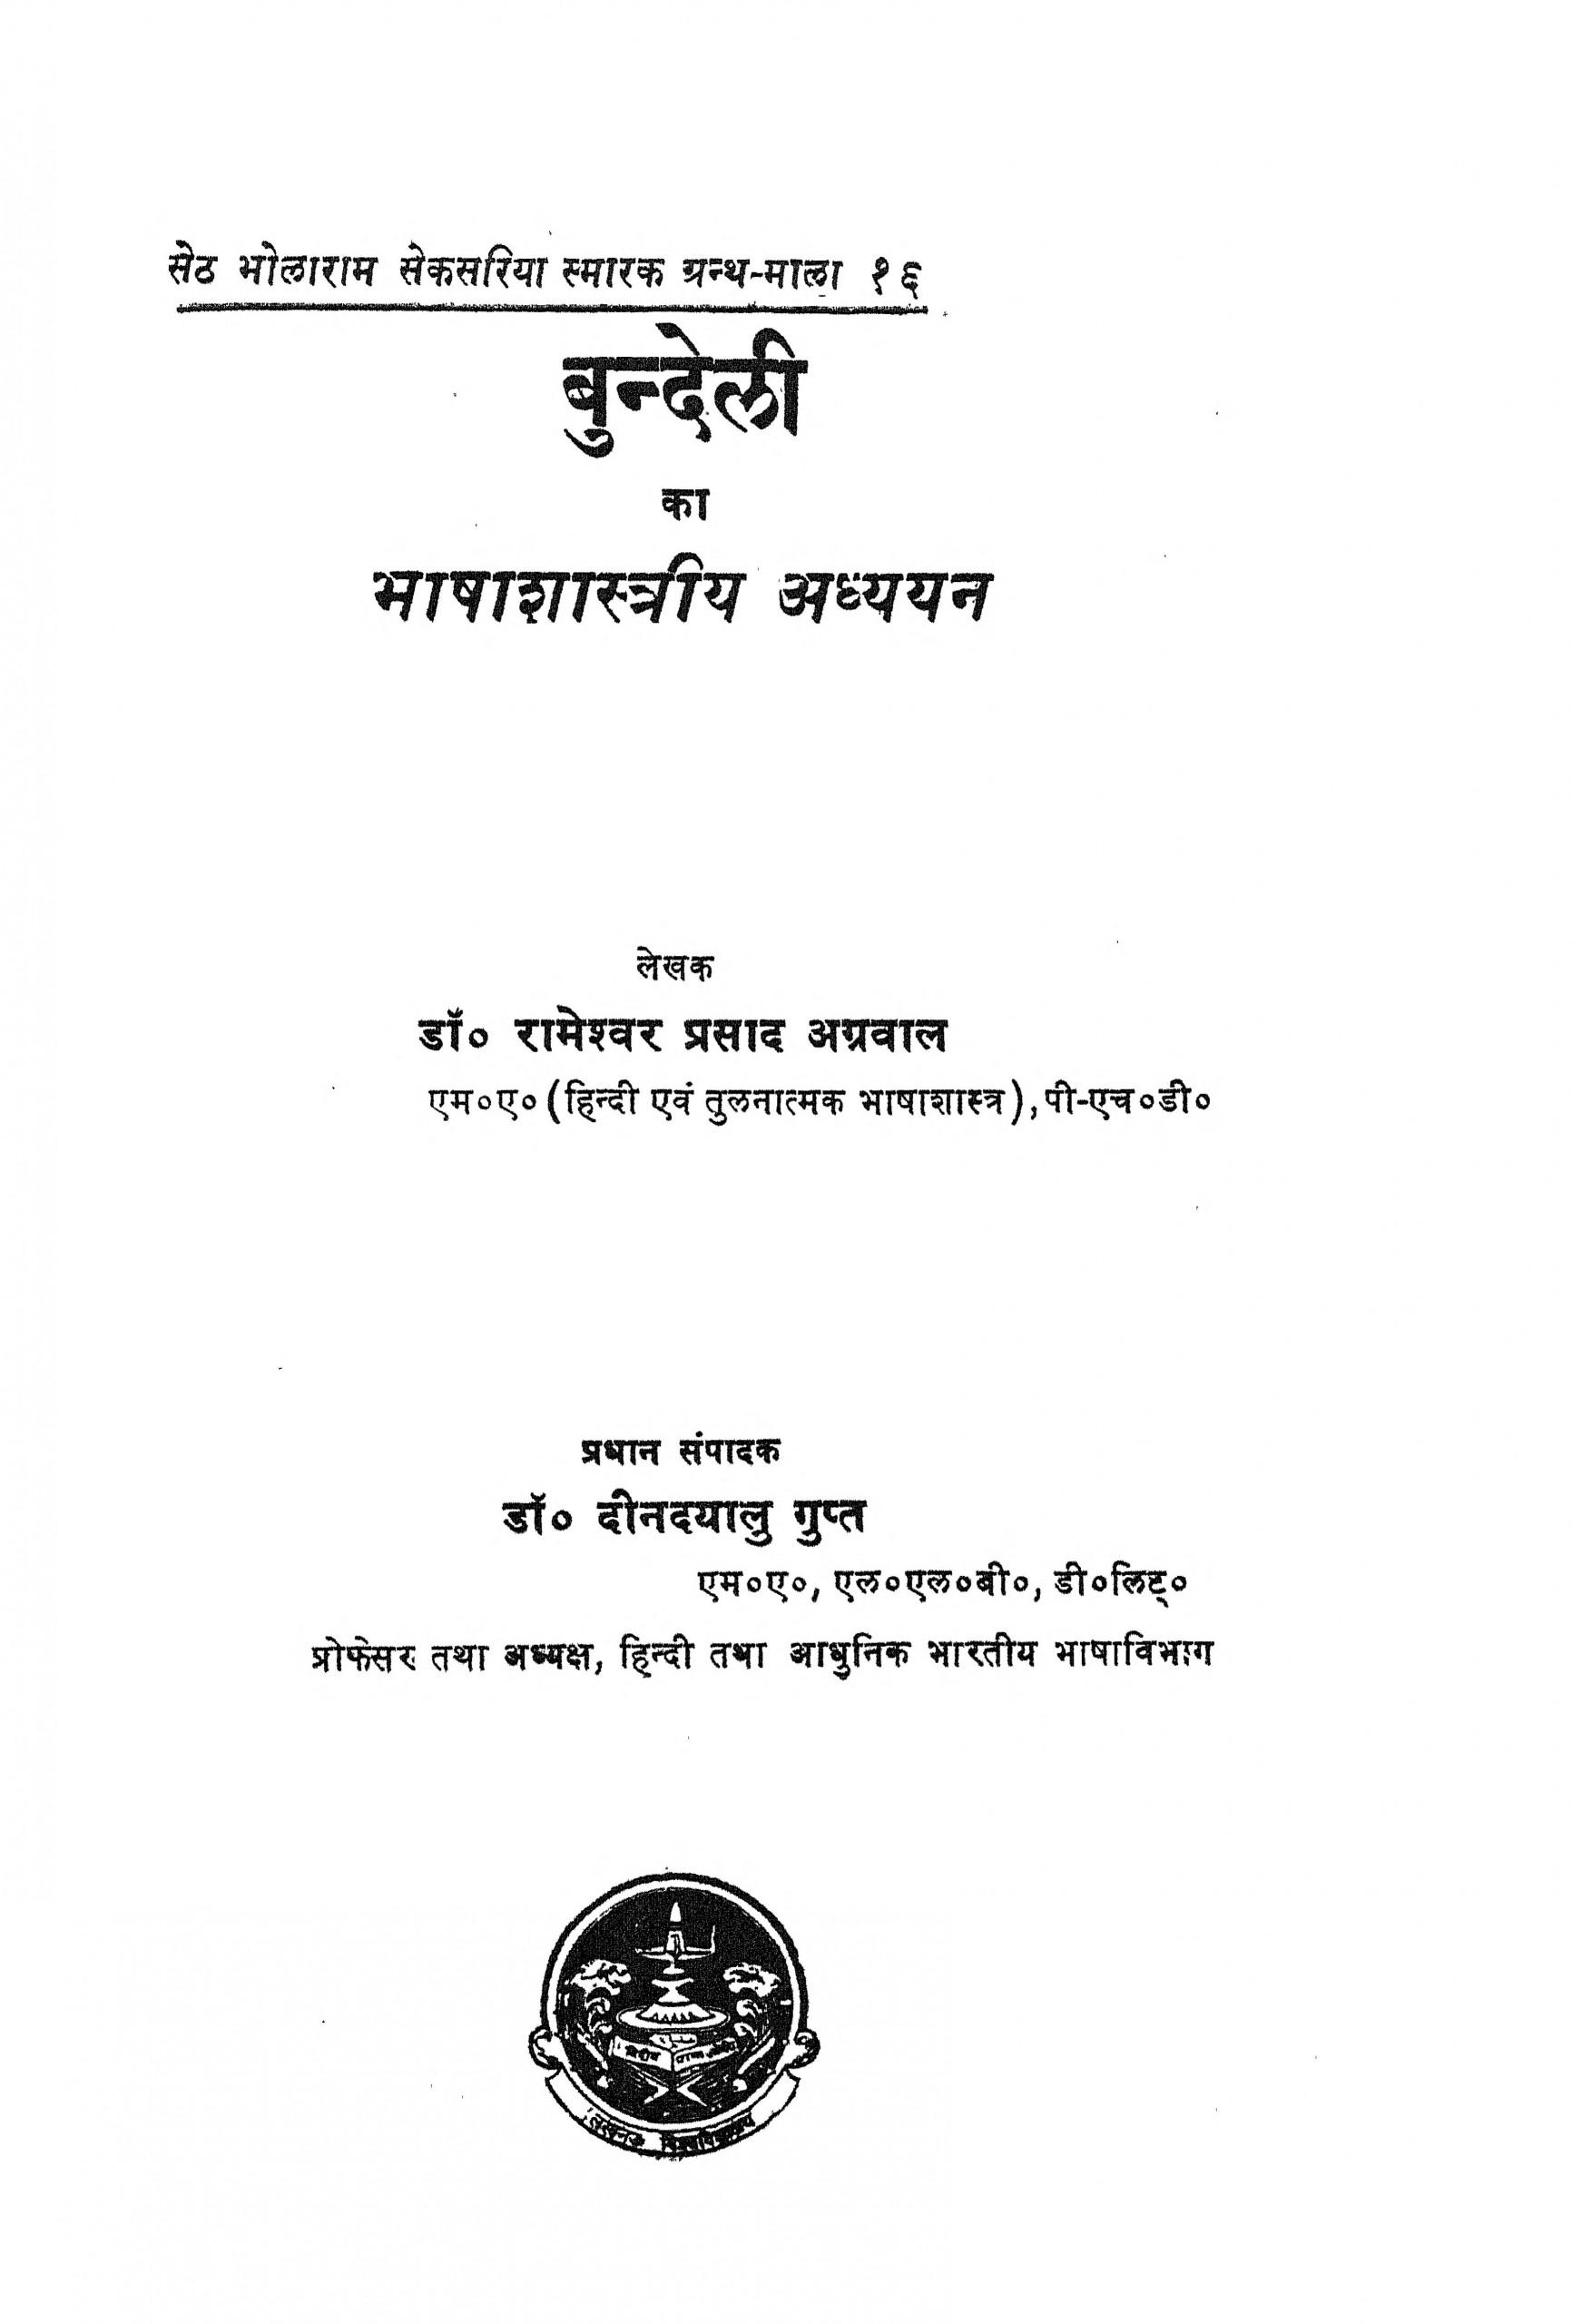 Book Image : बुन्देली का भाषाशास्त्रीय अध्ययन - Bundeli Ka Bhashashastreey Adhyayan